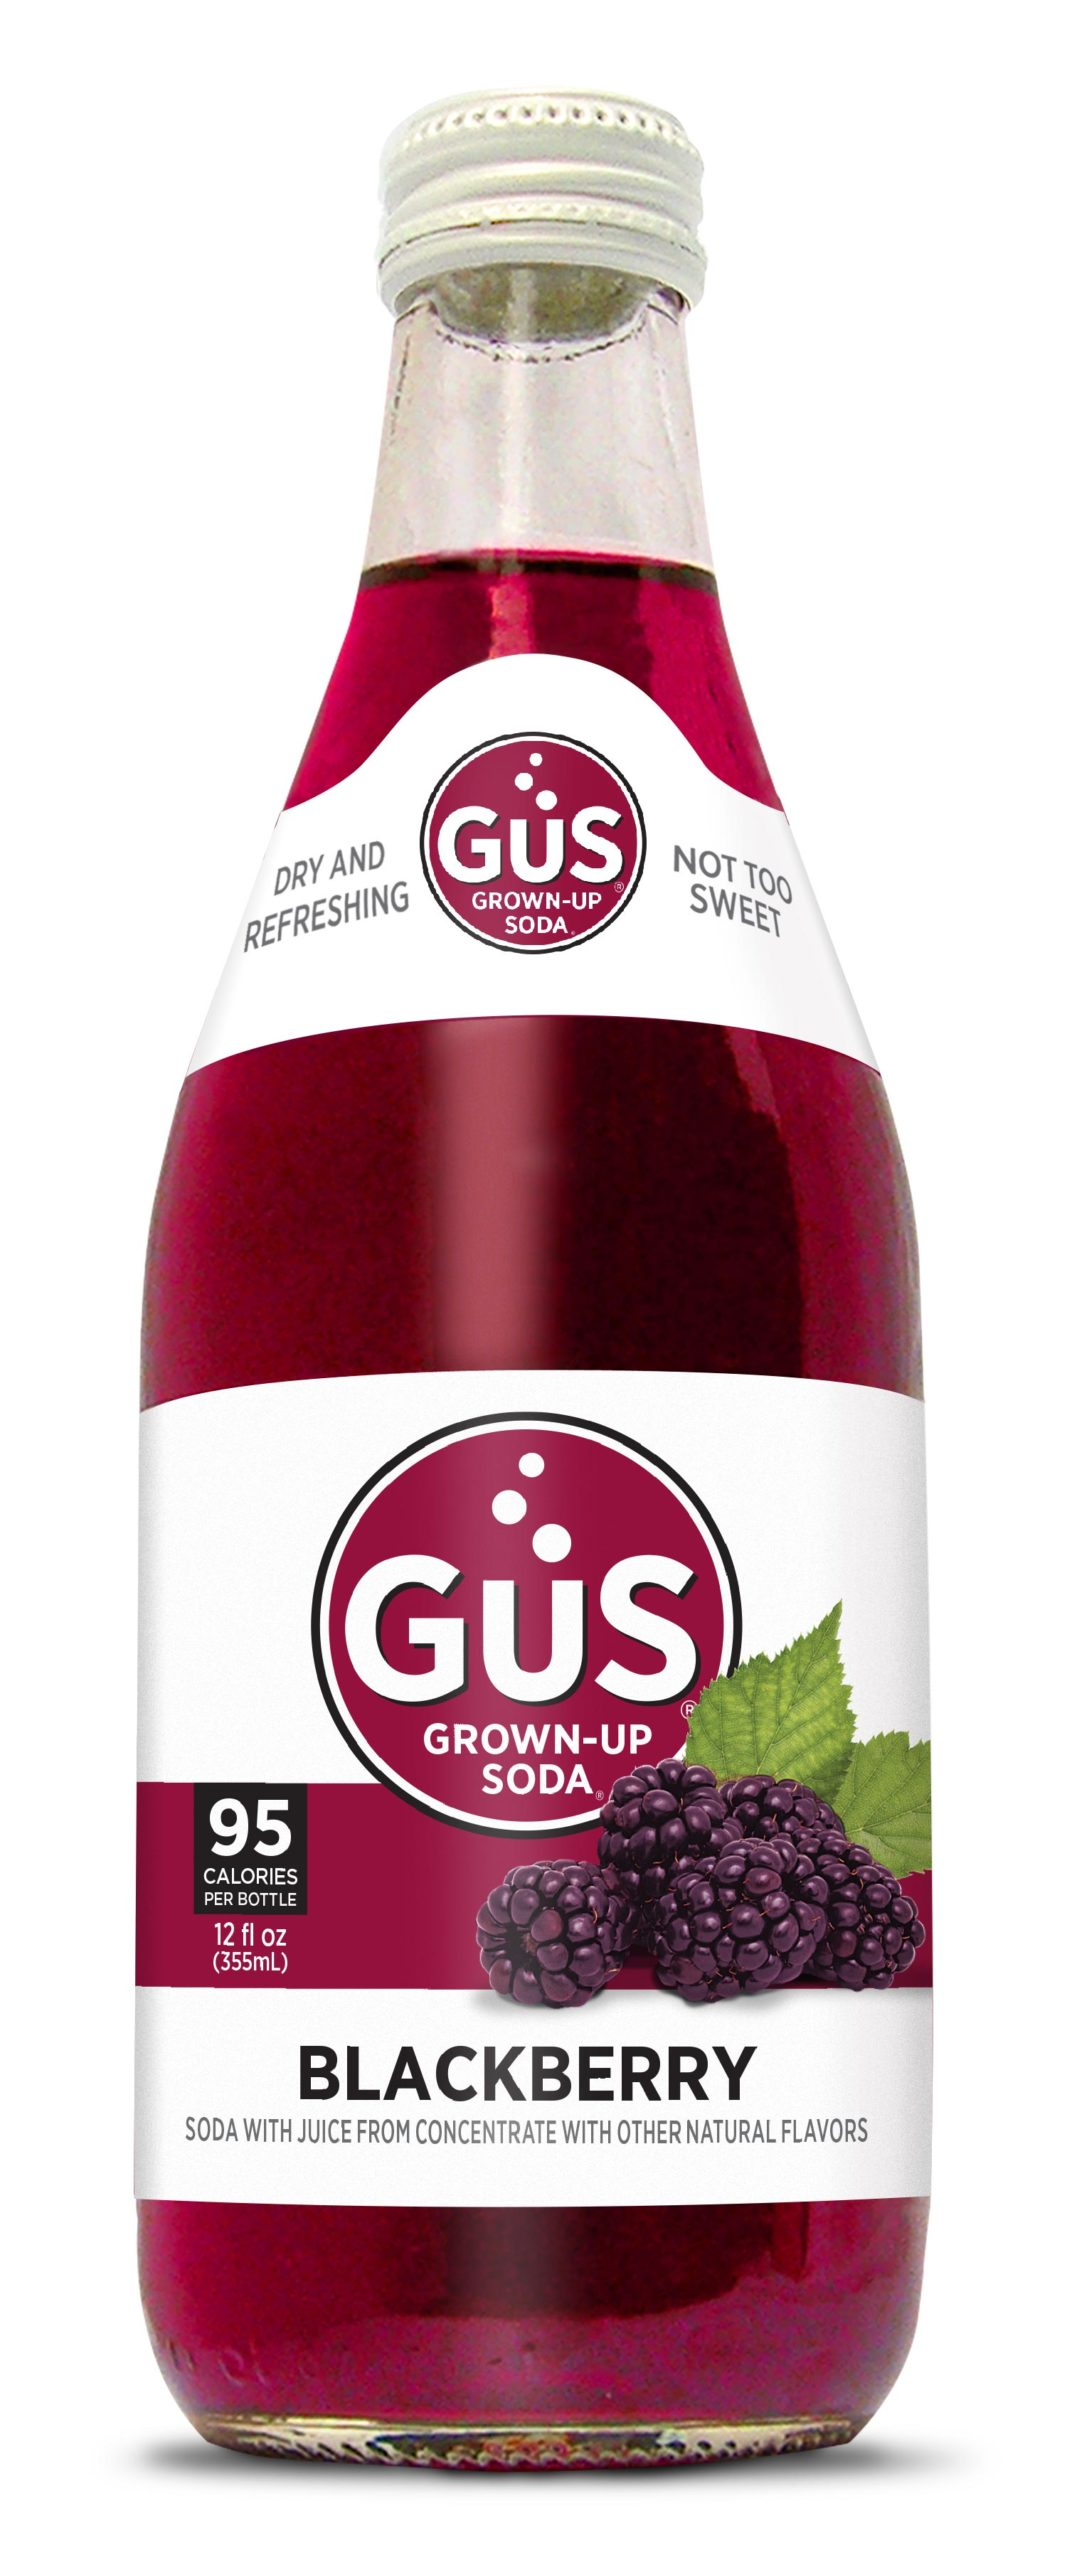 GuS Blackberry Soda